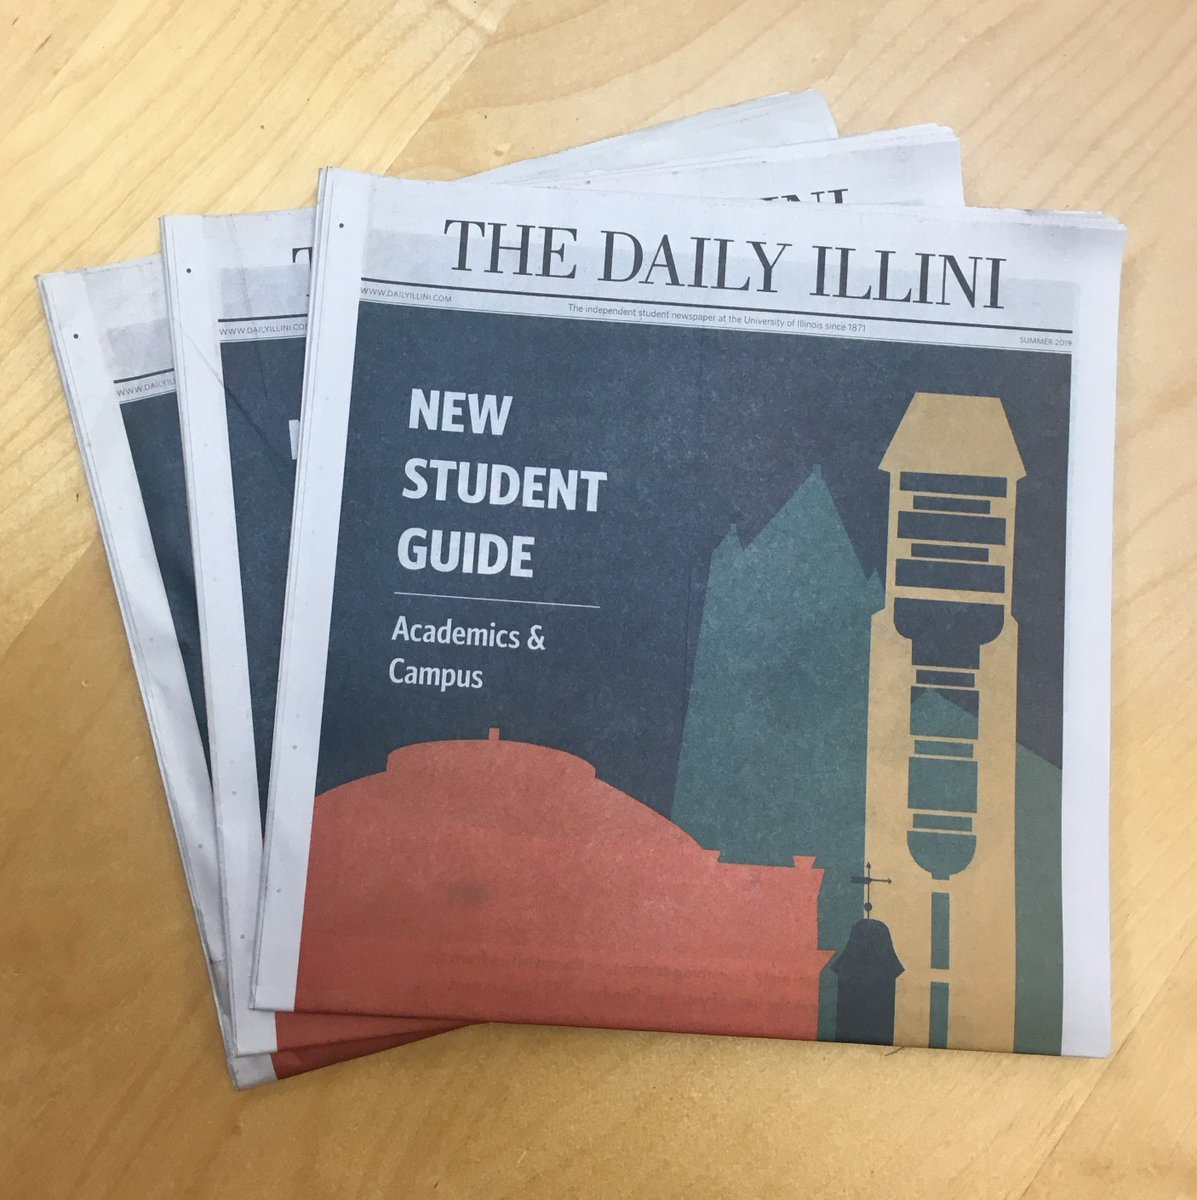 The Daily Illini (@TheDailyIllini) | Twitter